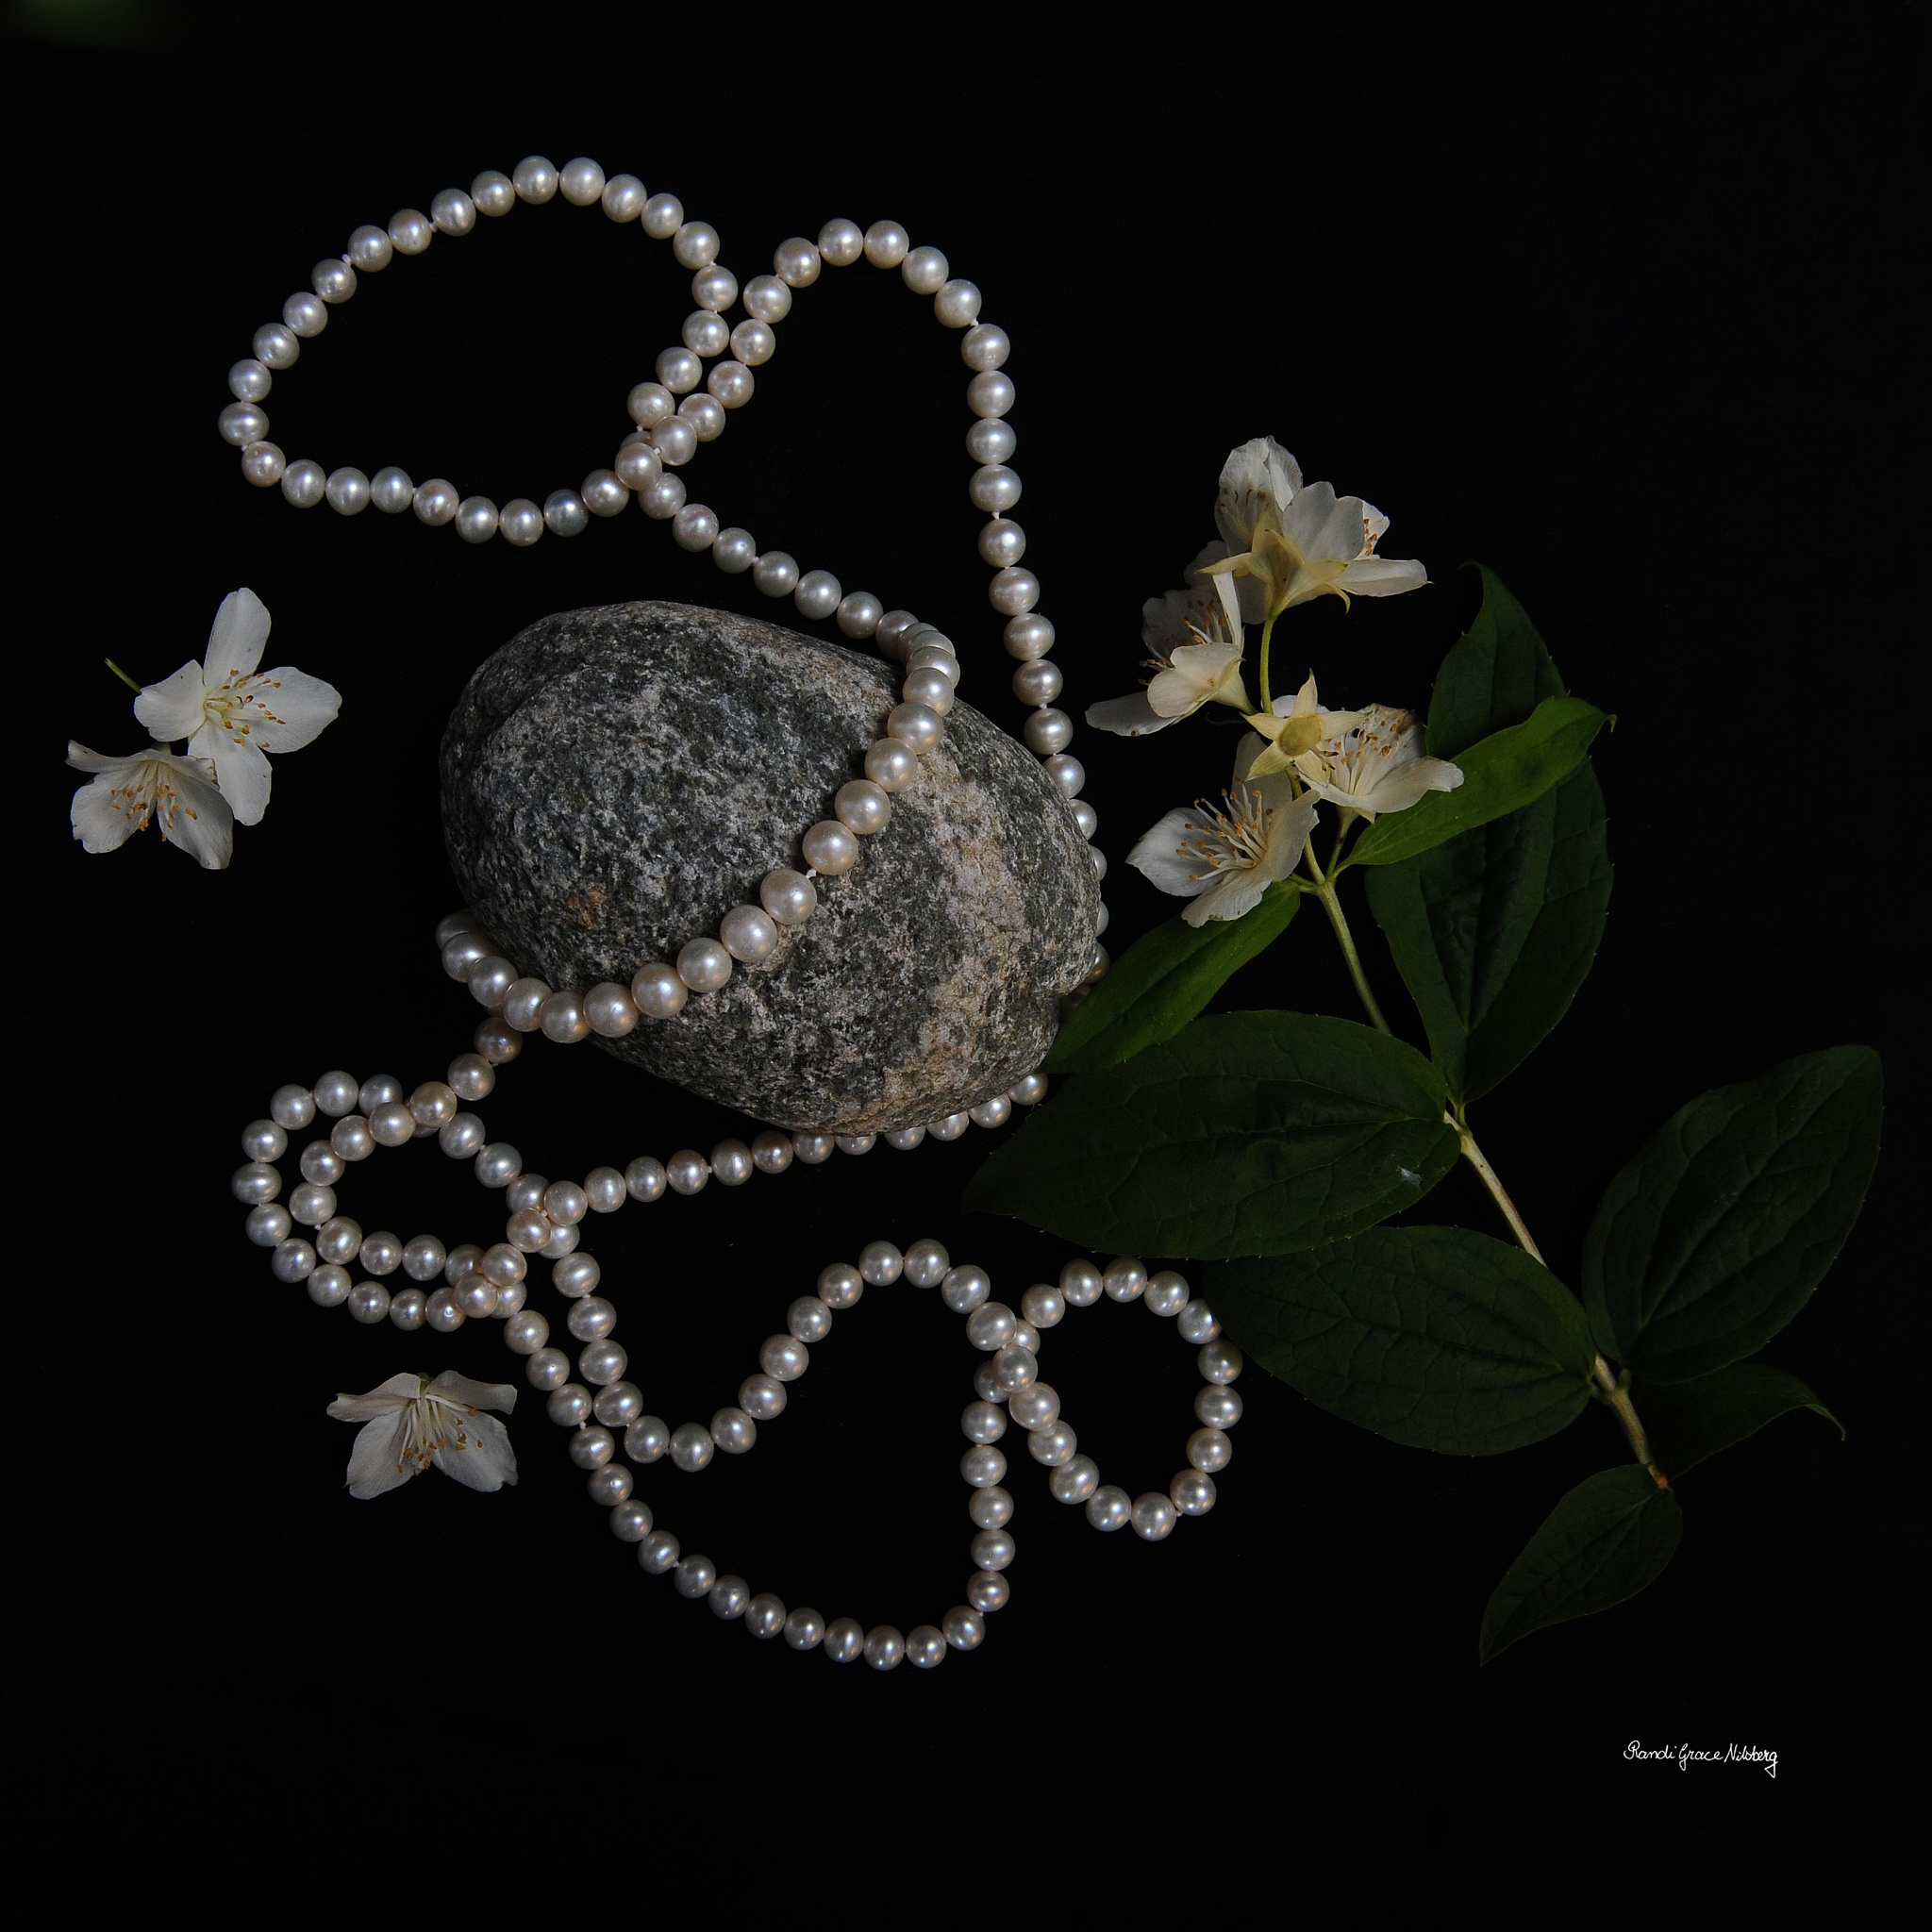 Jasmine and Pearls by Randi Grace Nilsberg